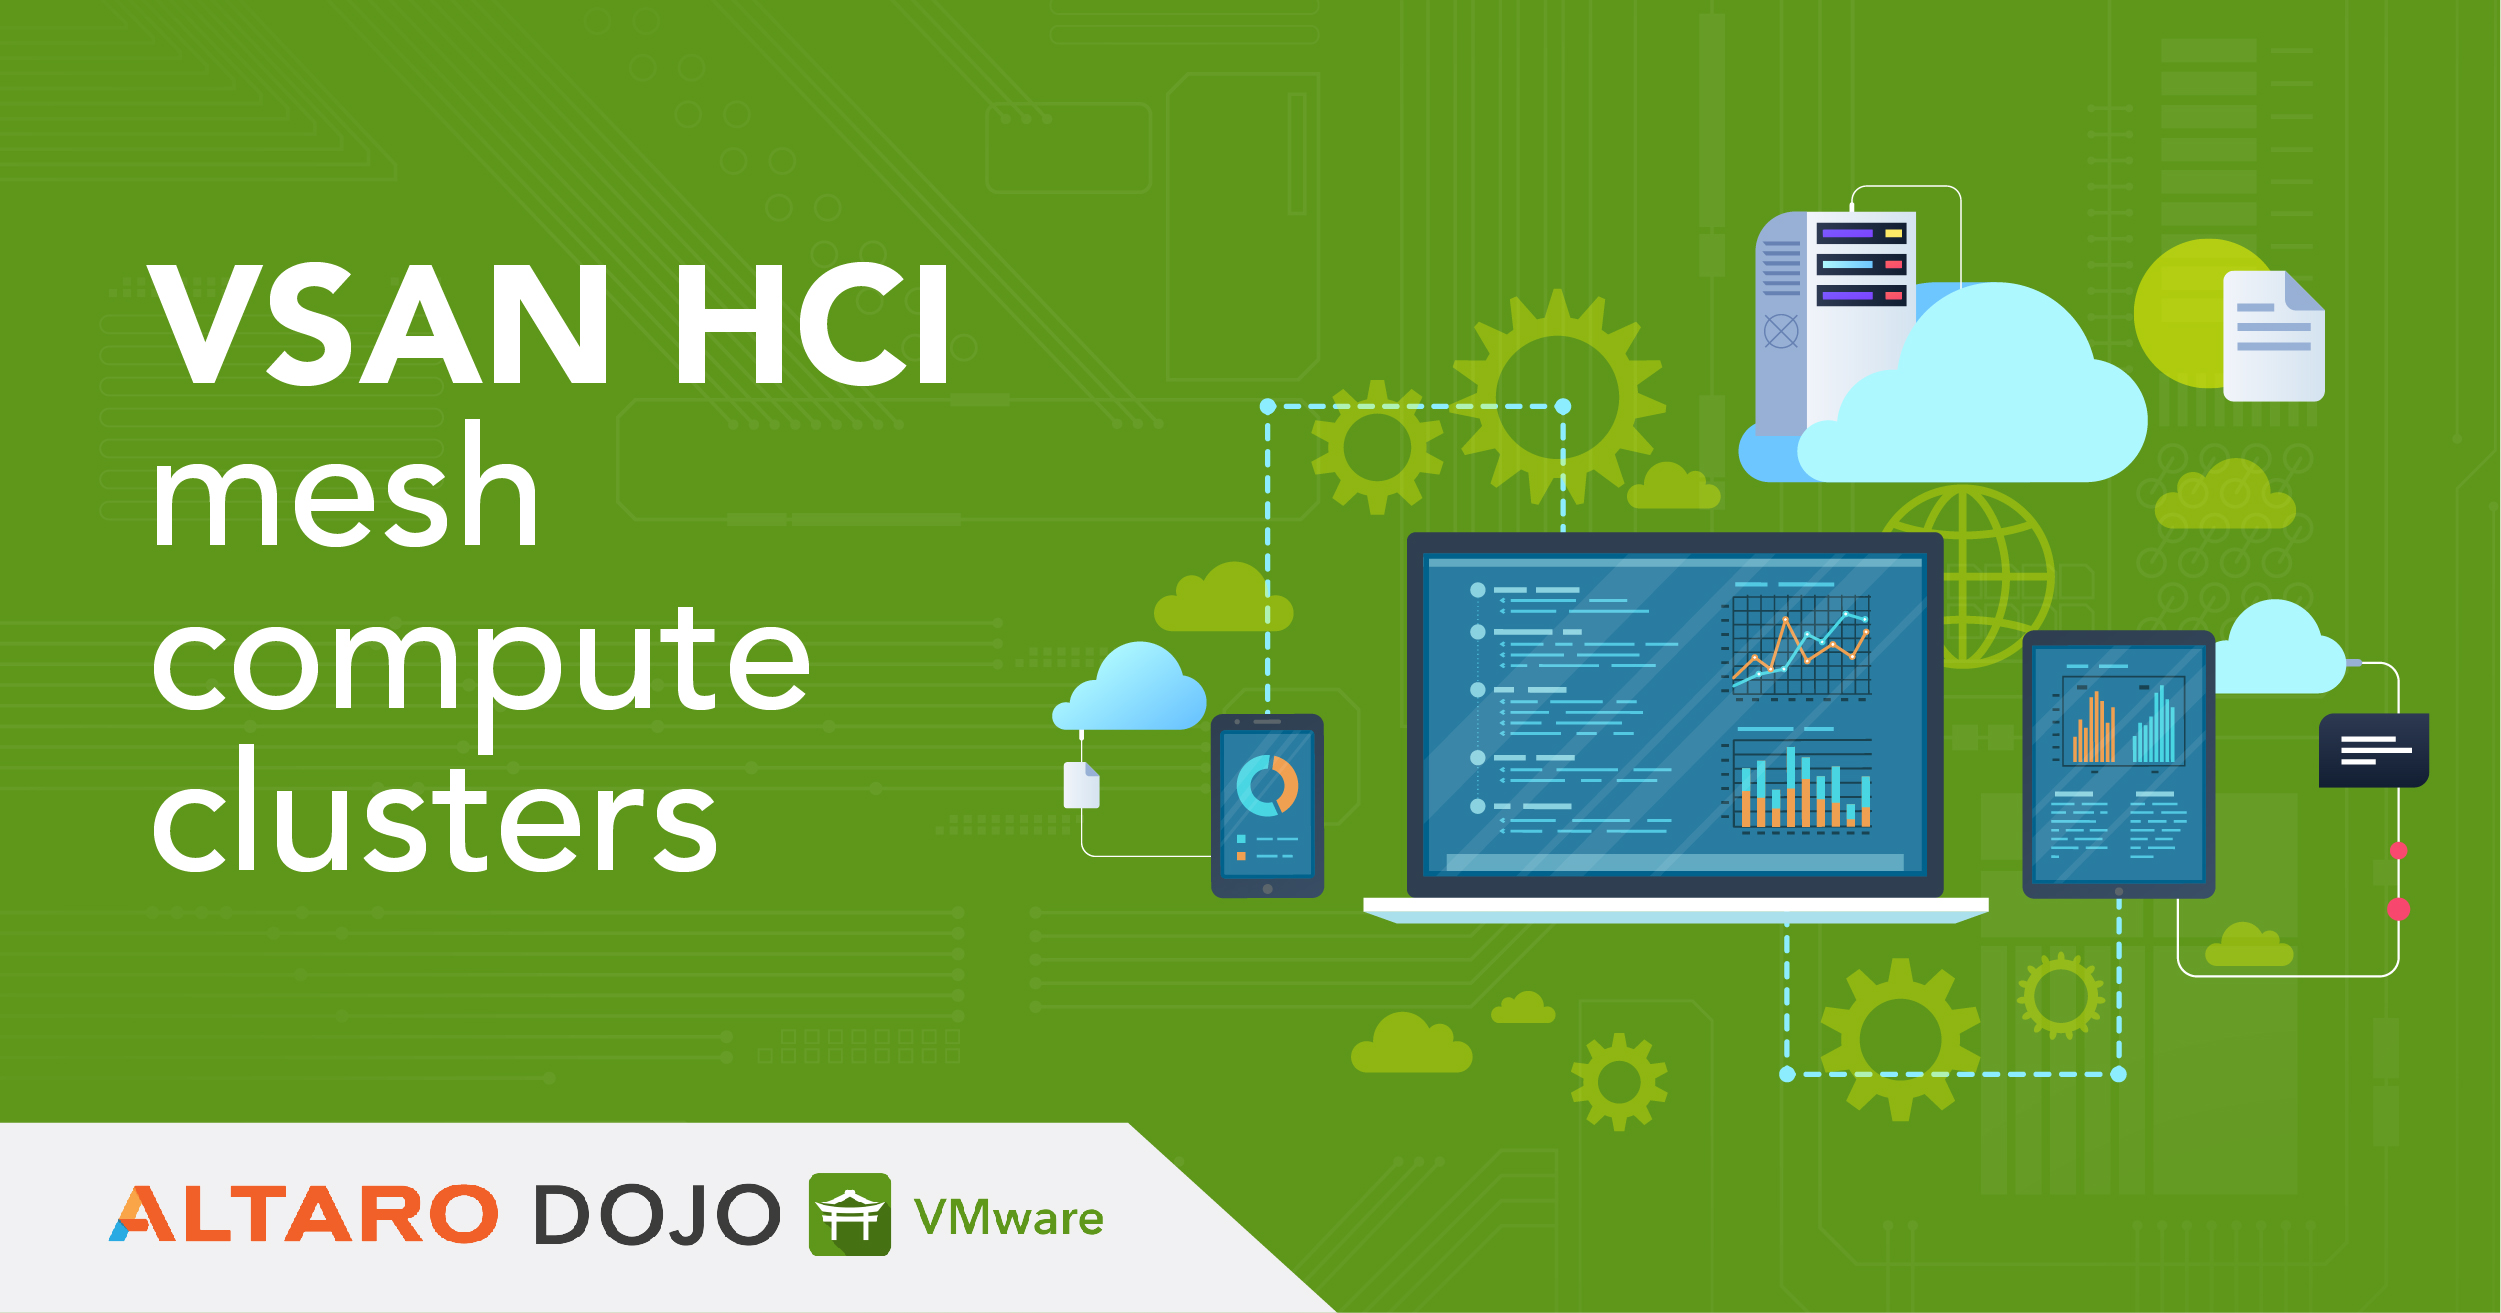 What is VSAN HCI mesh compute cluster in vSphere 7 Update 2?